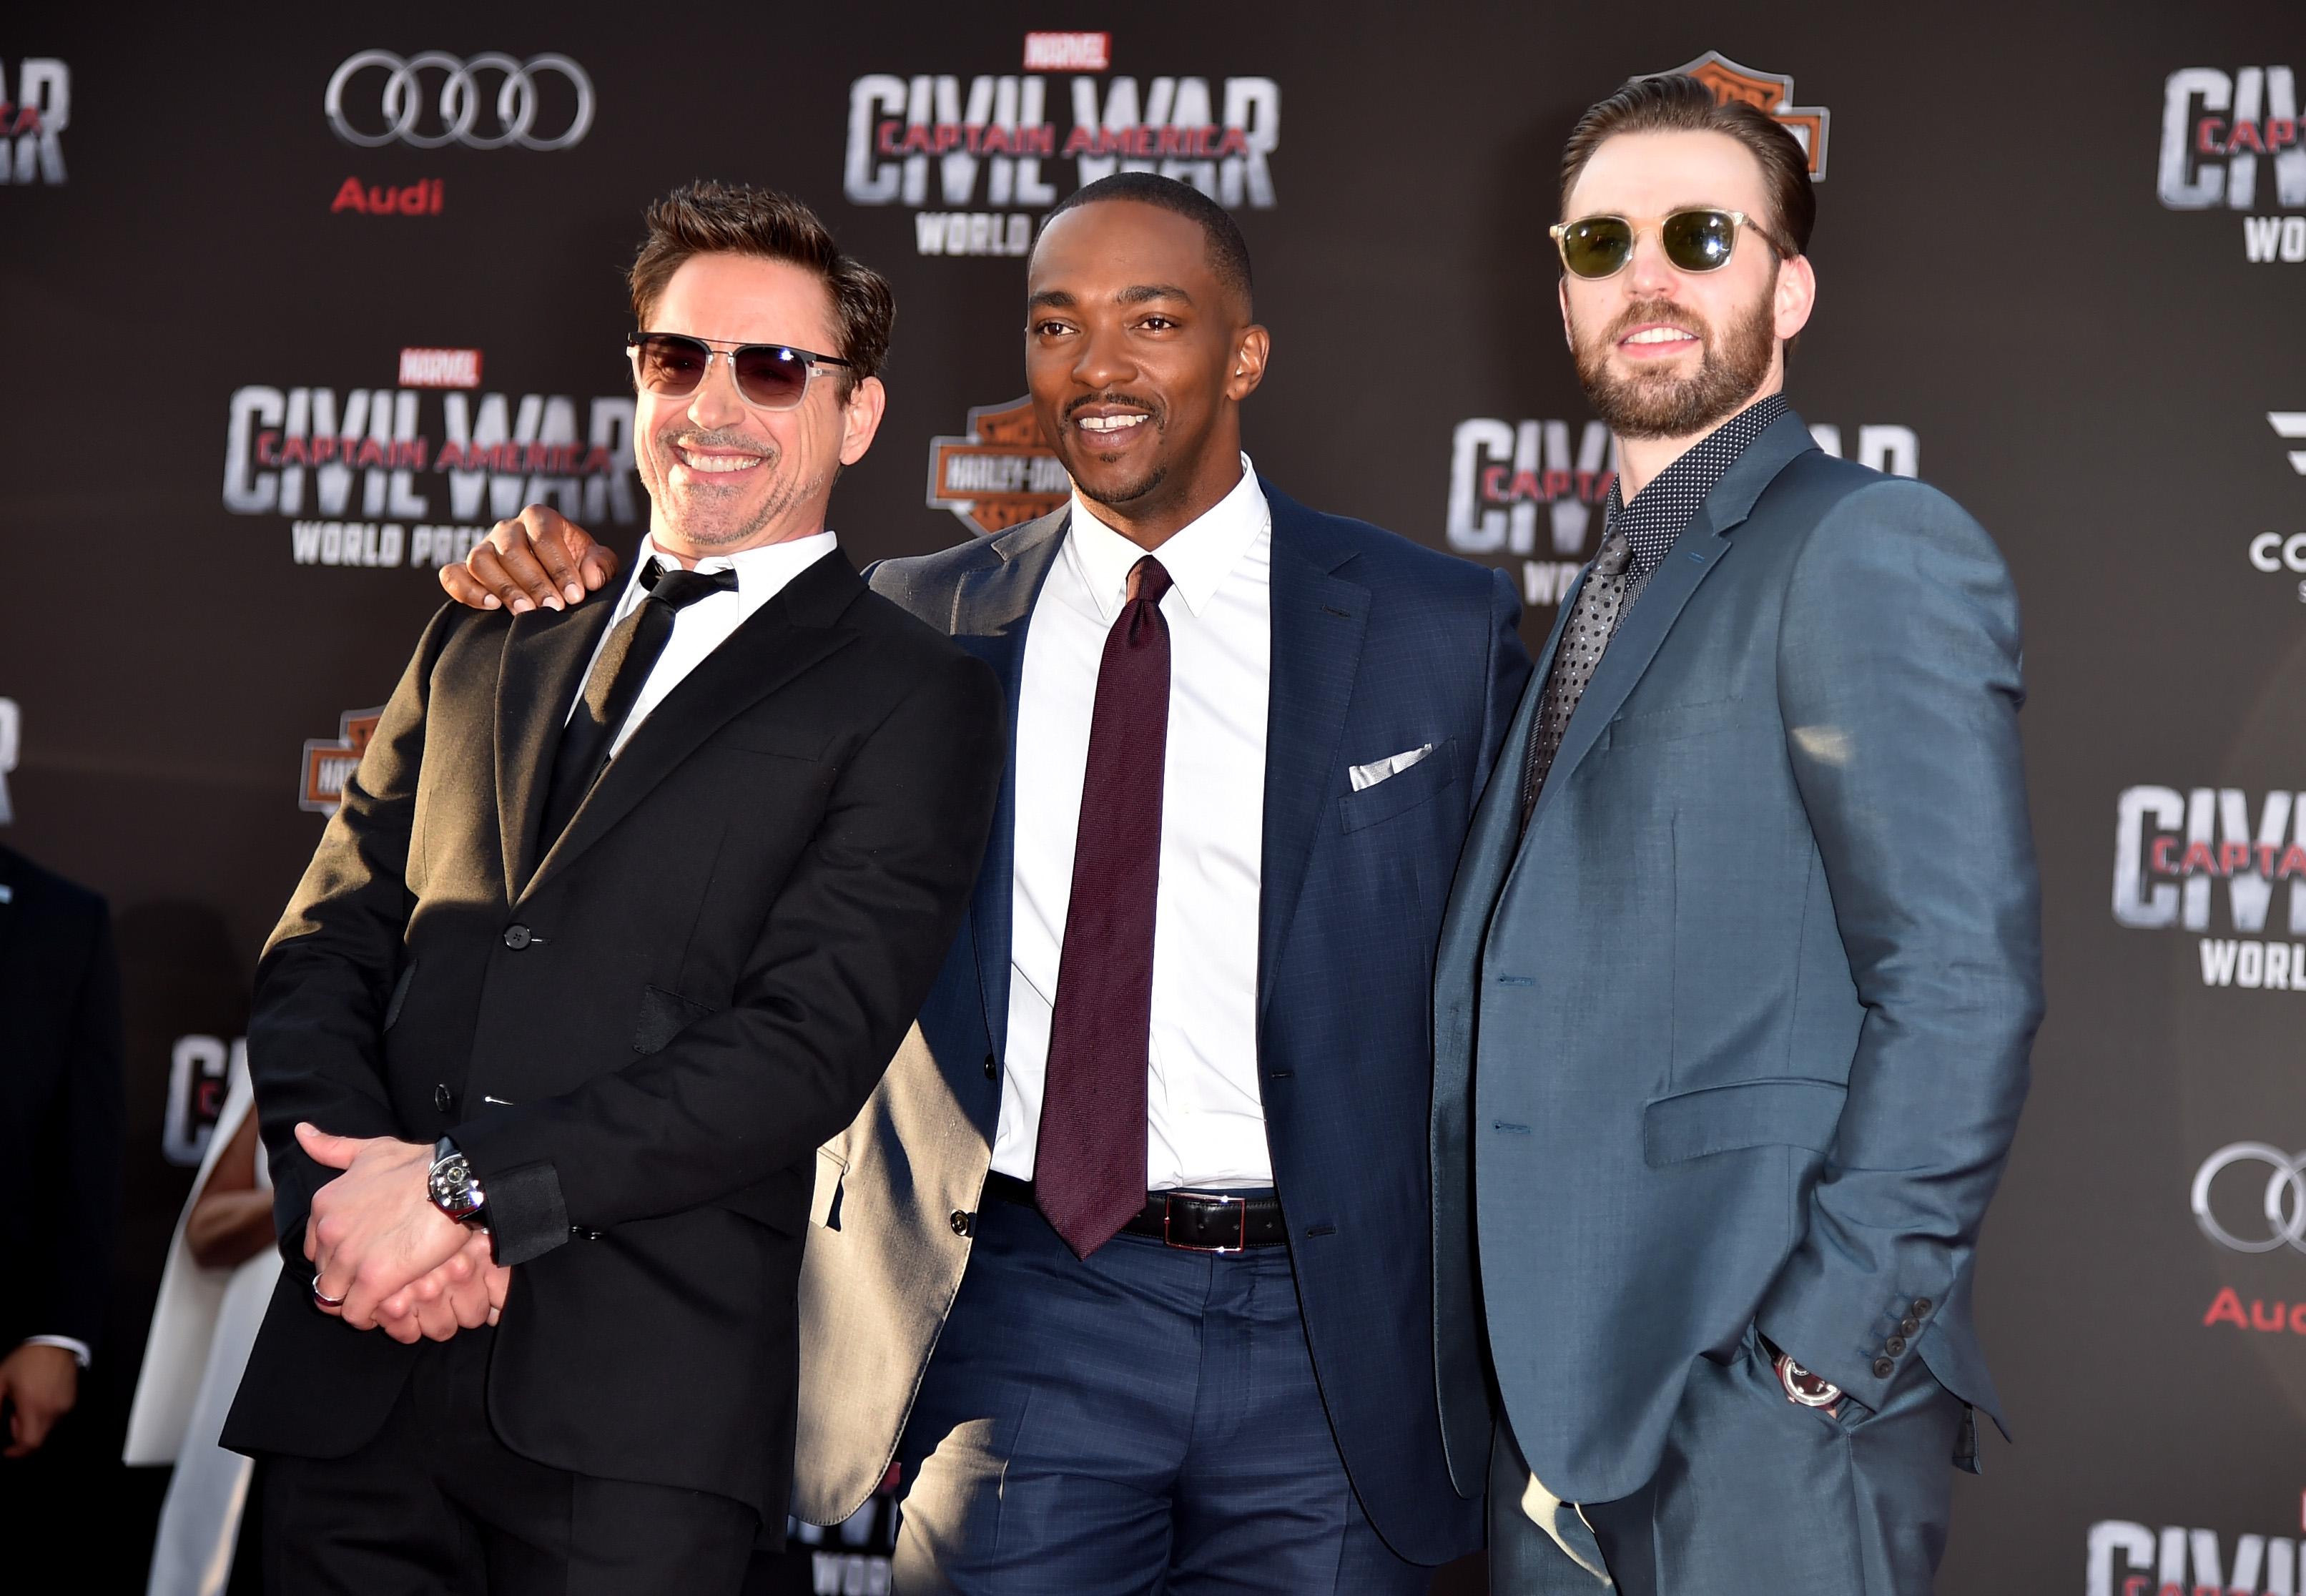 Will Disney pull Star Wars and Marvel movies off Netflix